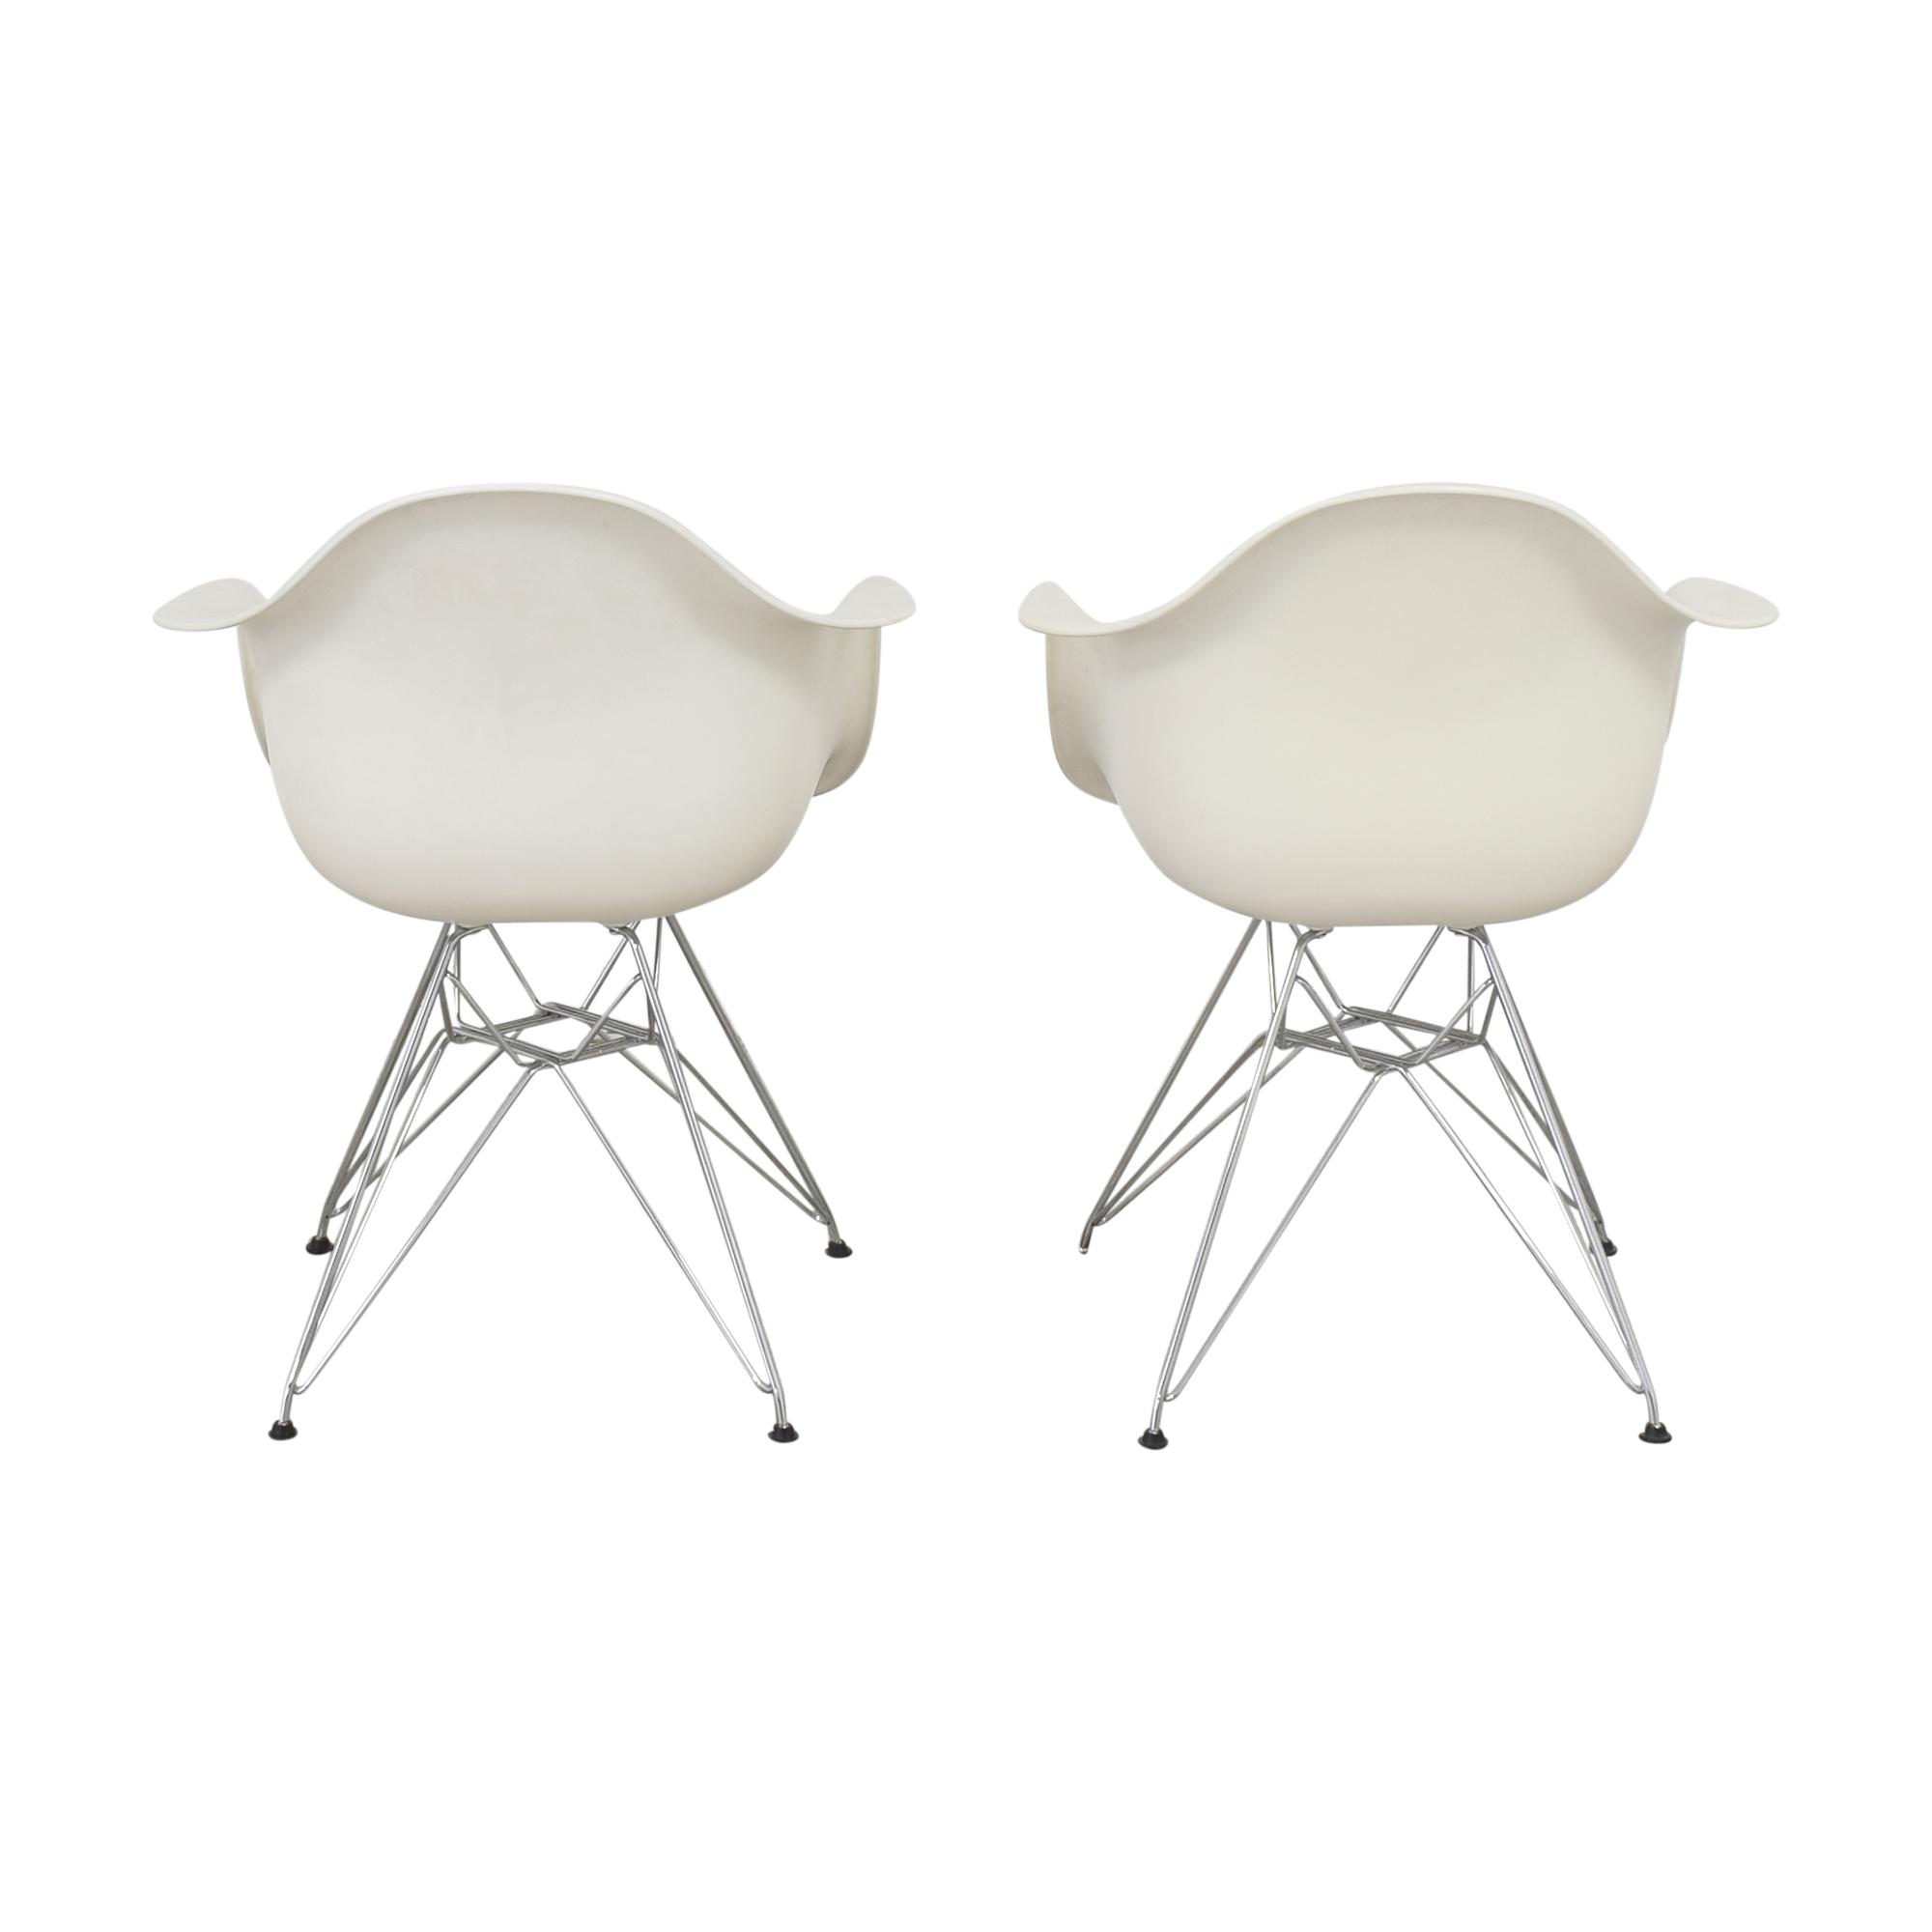 Herman Miller Herman Miller Eames Molded Arm Chairs nj